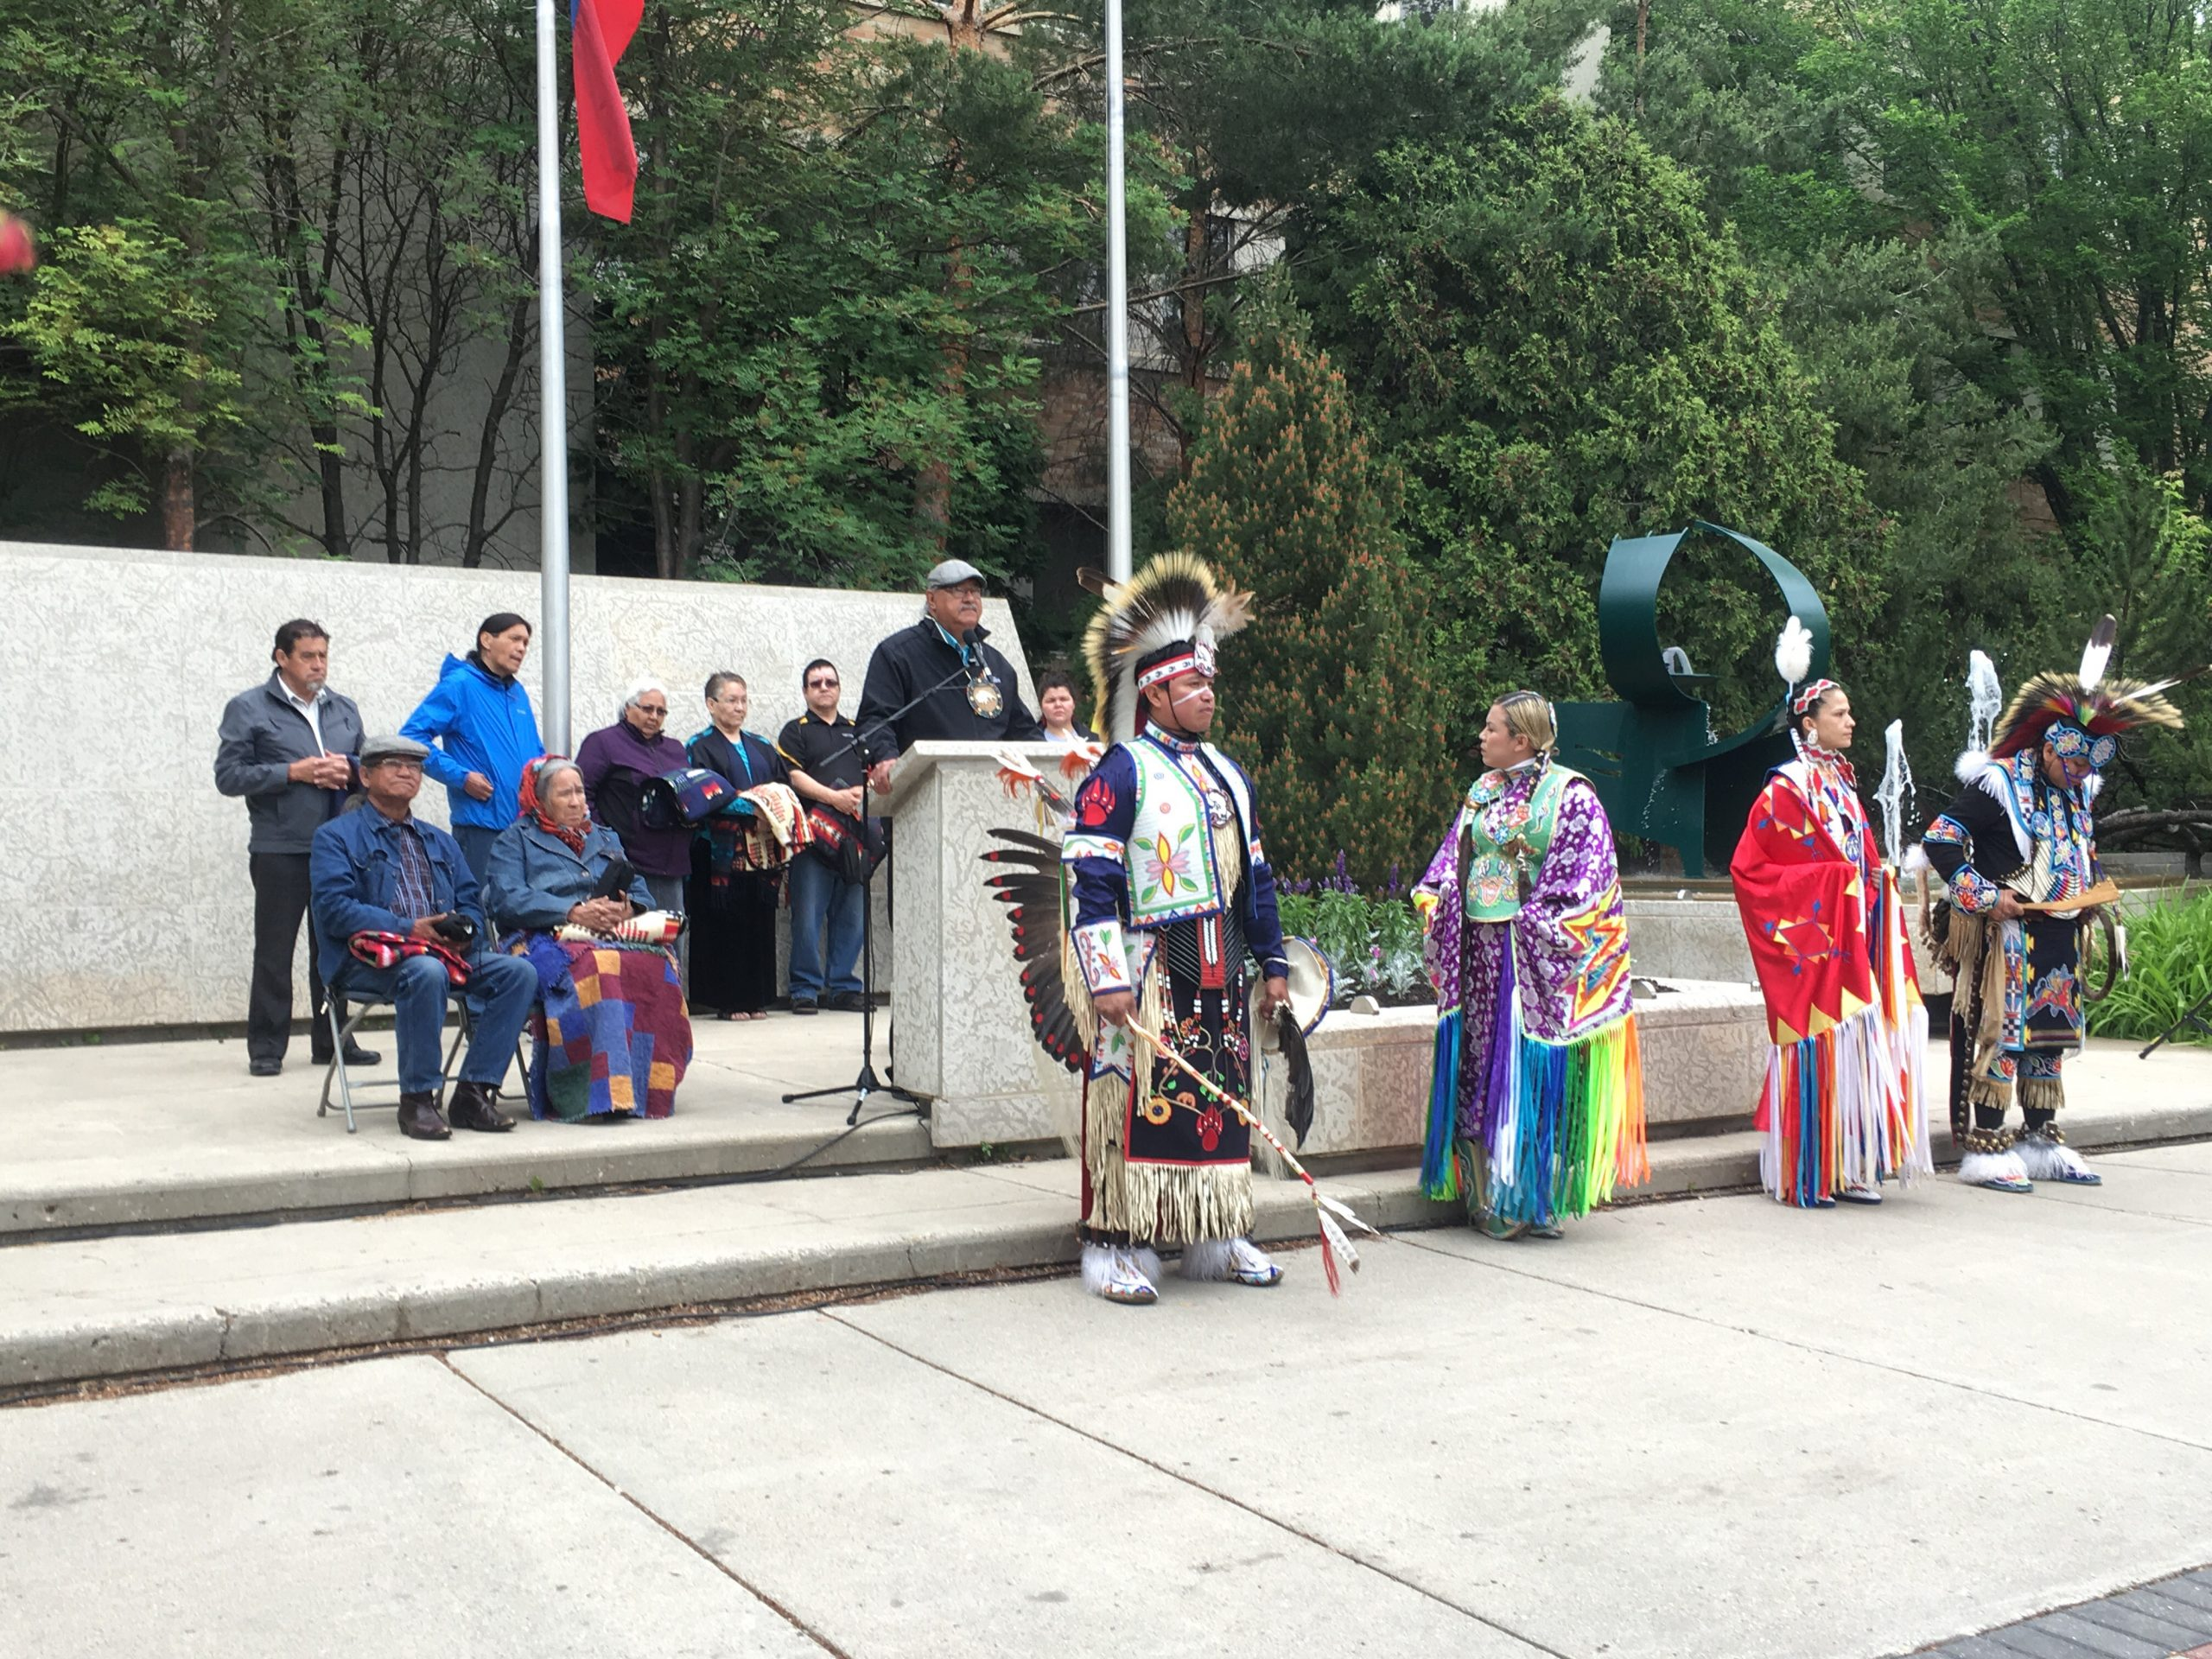 'Healing process:' Reconciliation flag raised in Saskatoon